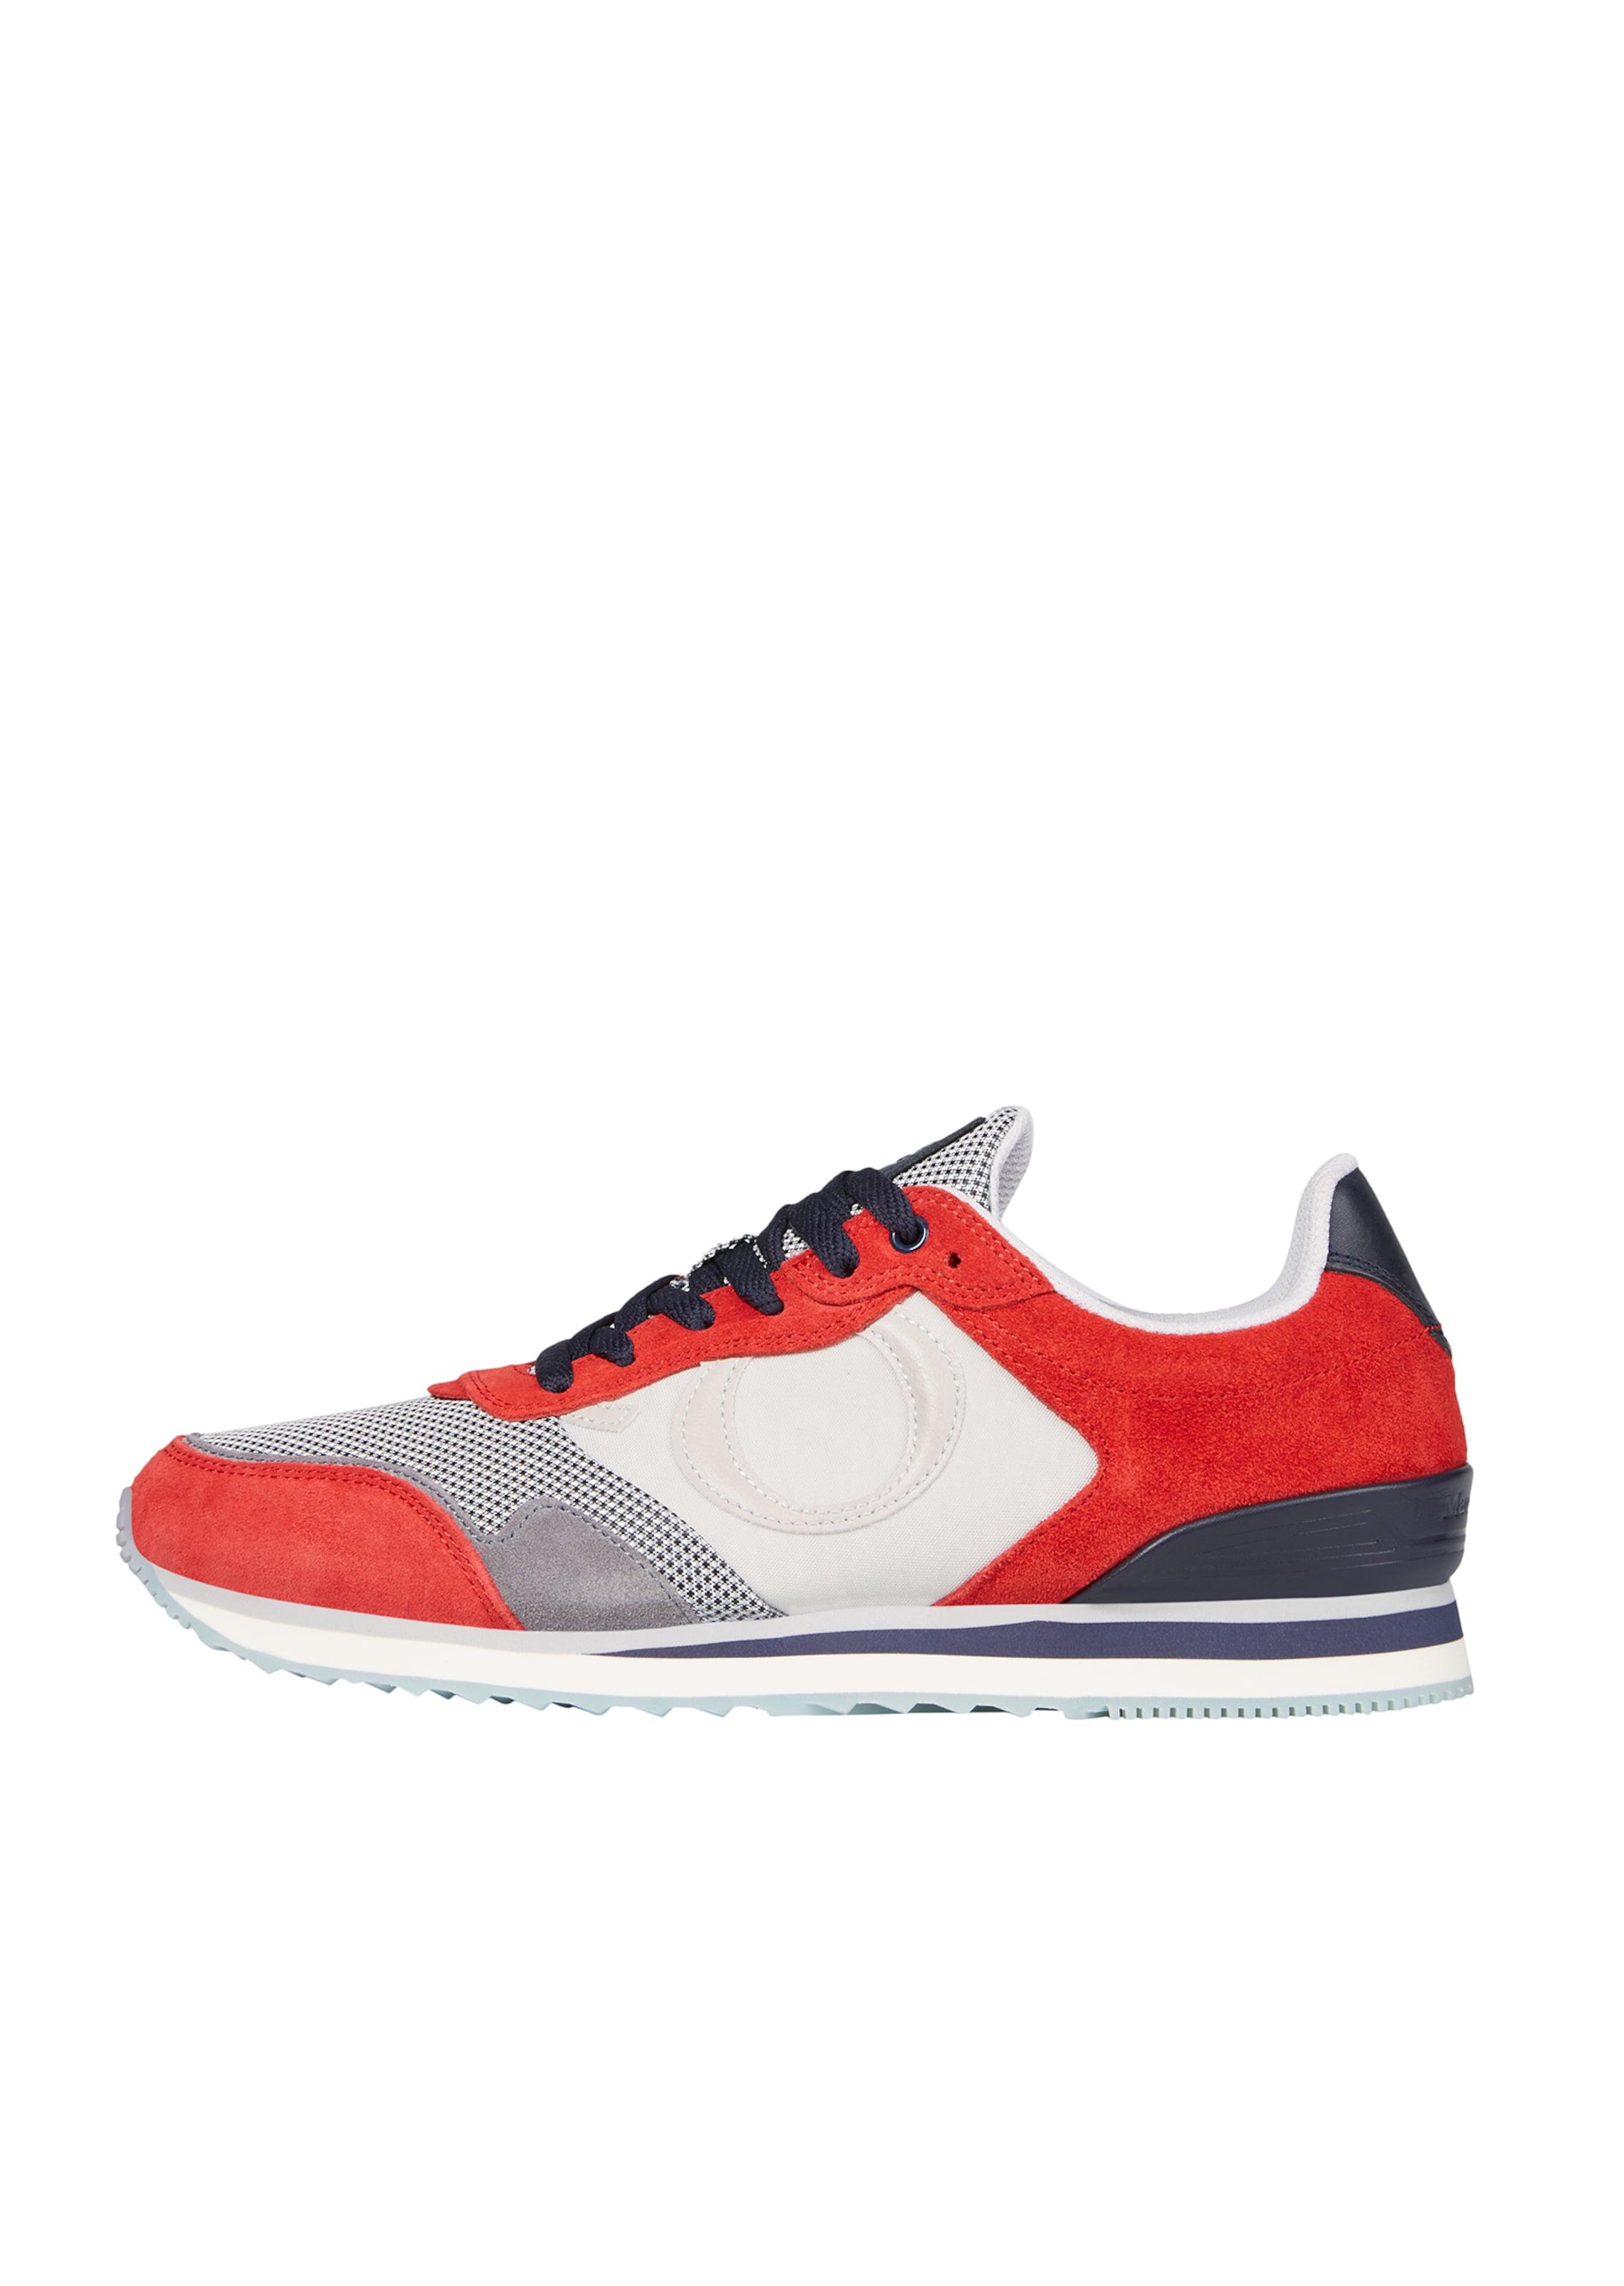 Marc O Polo Sneaker Verschleißfeste billige Schuhe